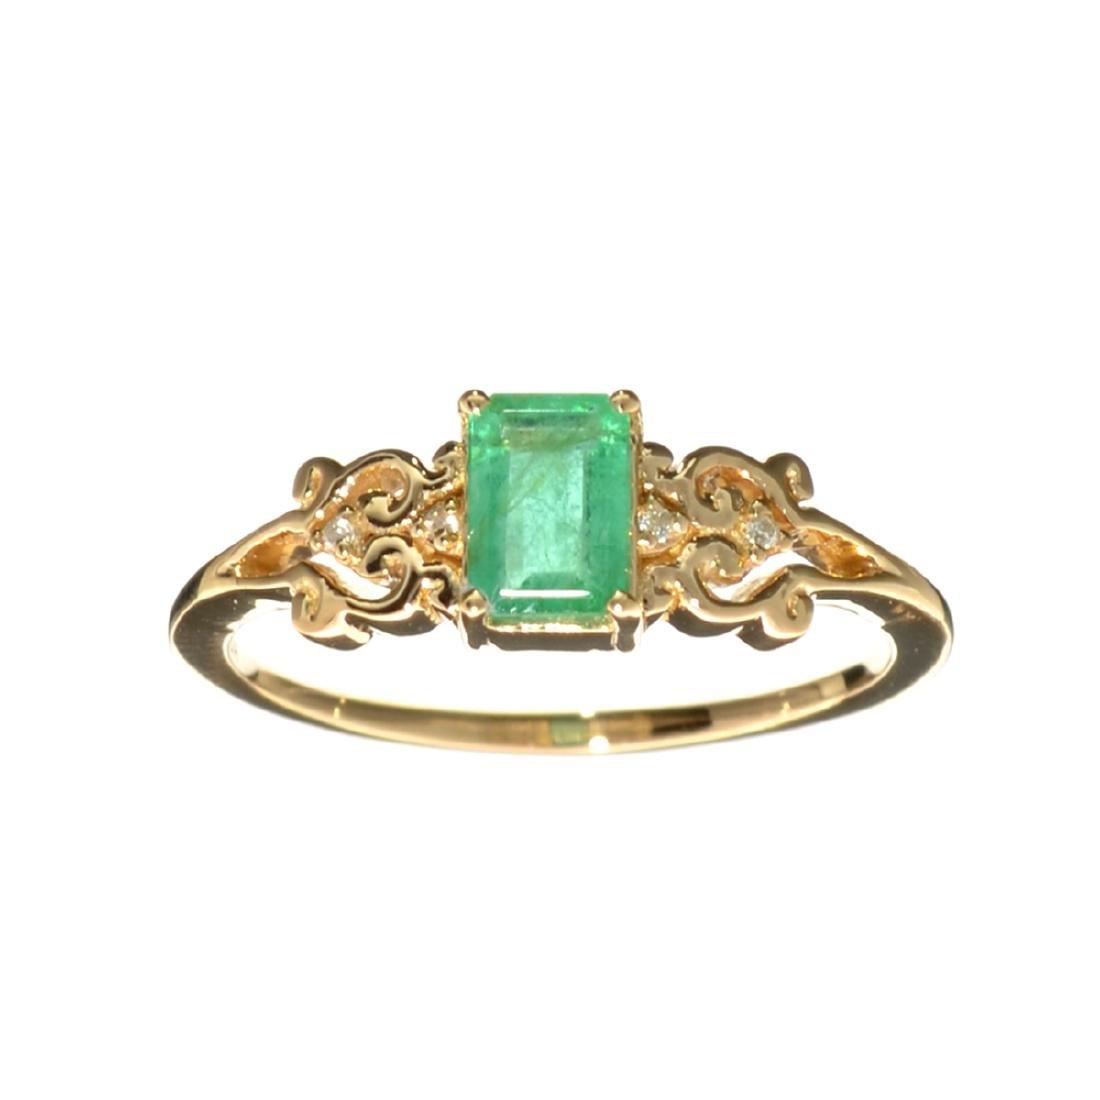 Designer Sebastian 14 KT Gold 0.61CT Emerald and 0.01CT